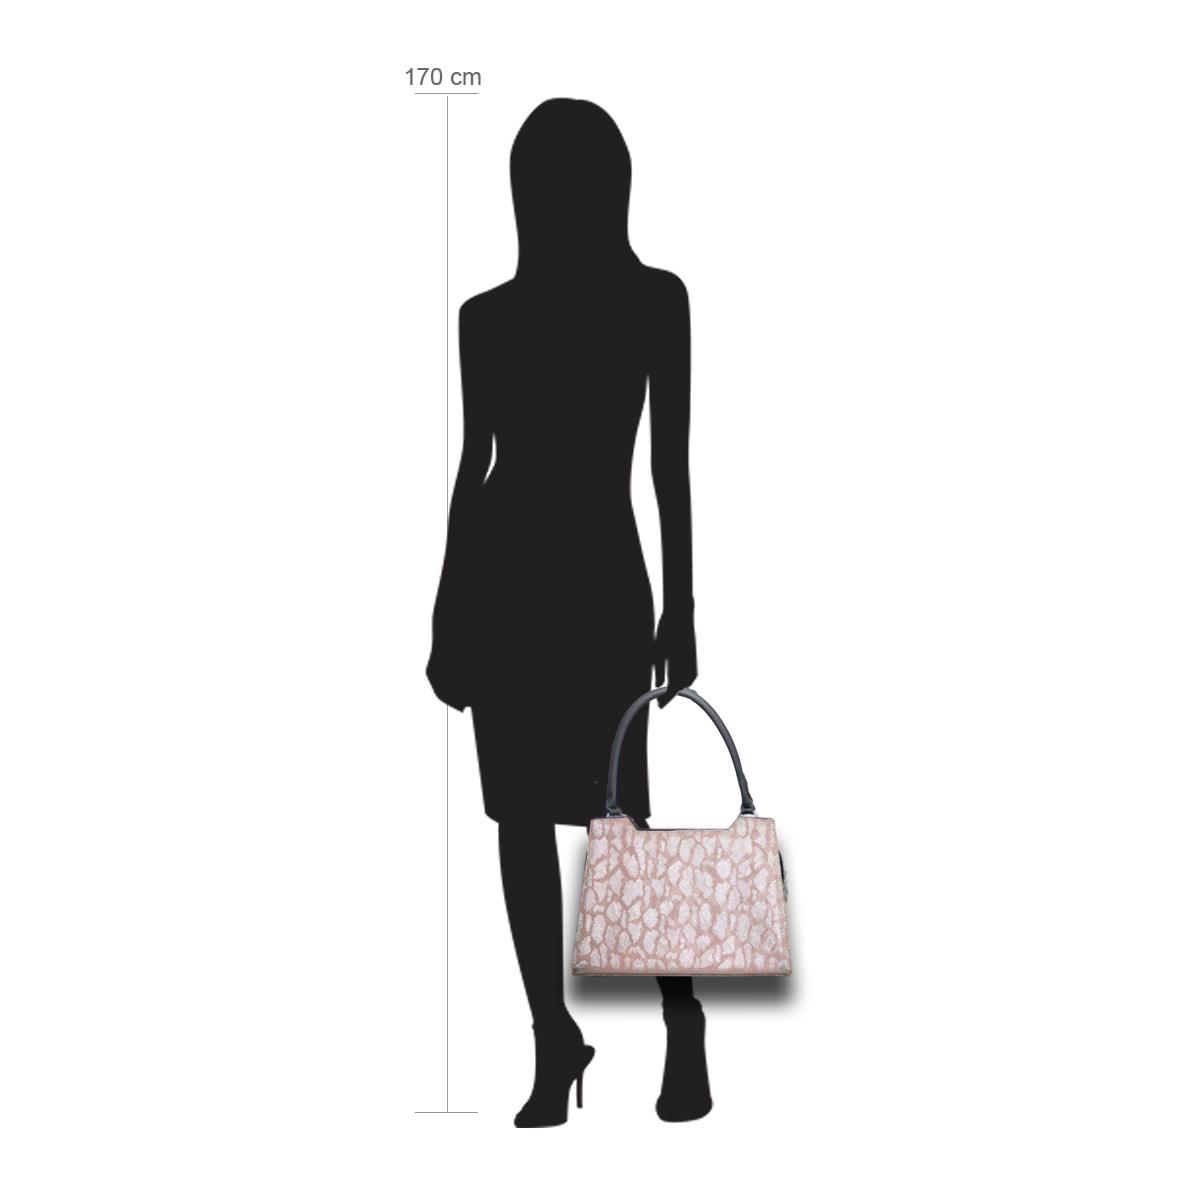 Delieta Puppe 170 cm groß  mit Handtasche Modell: Toulouse